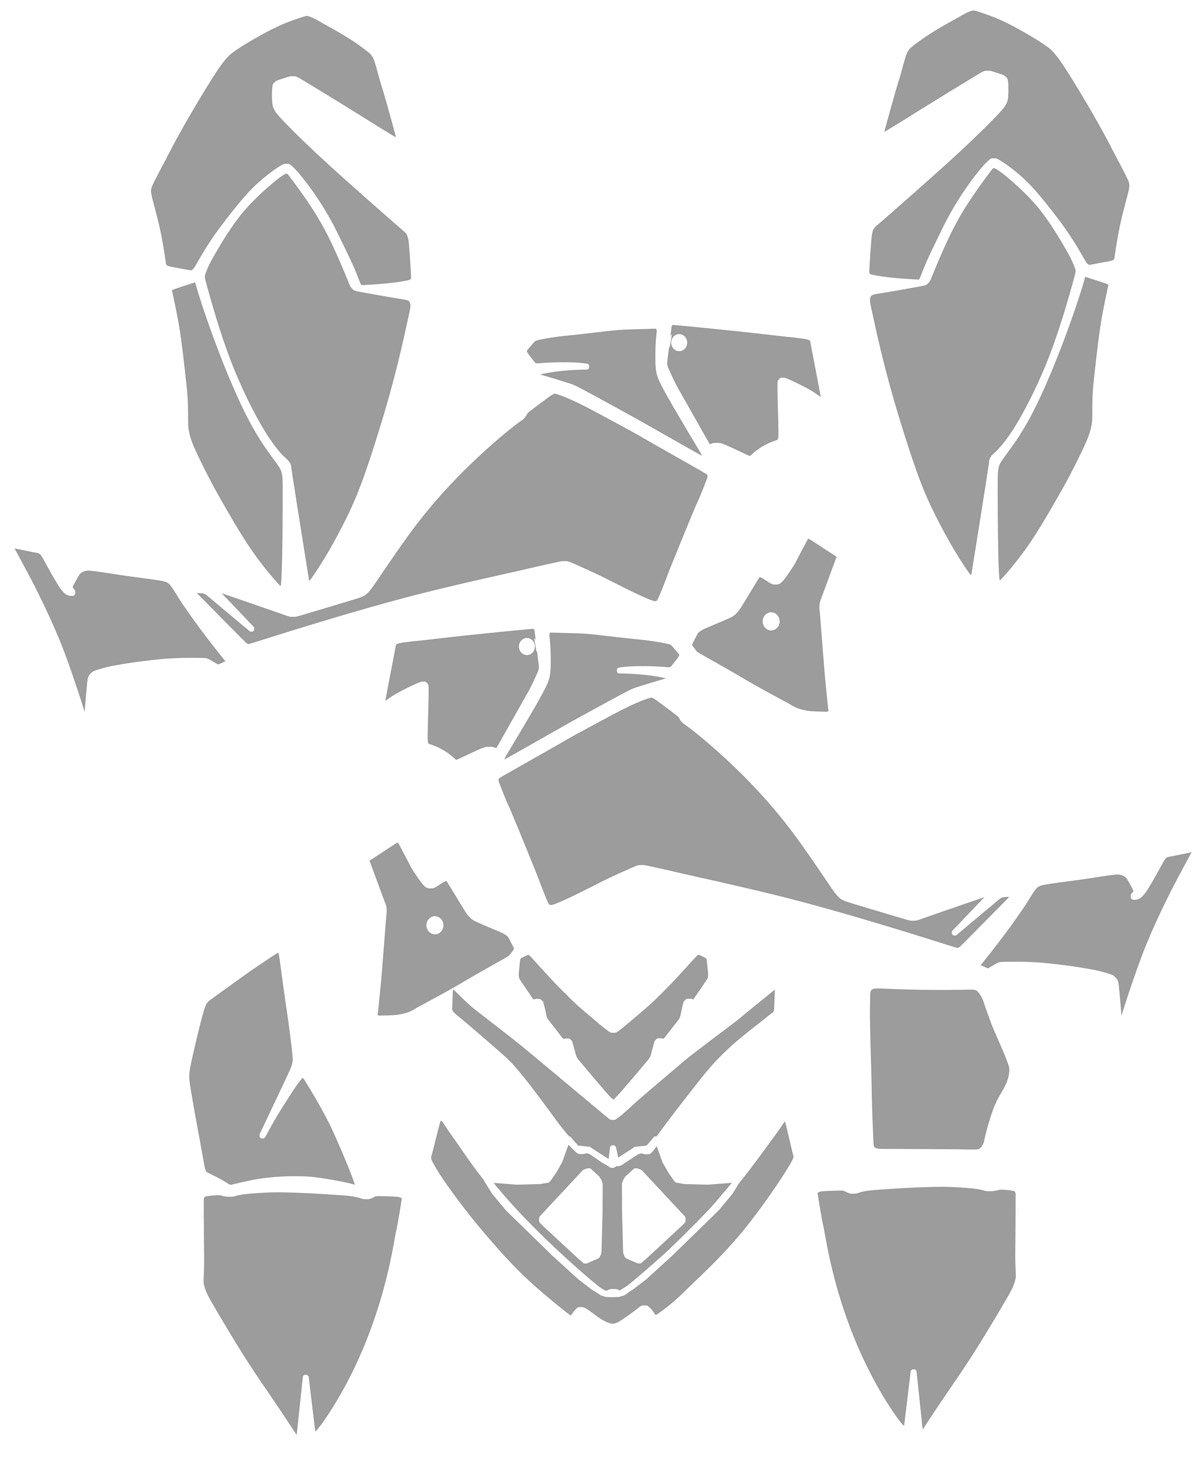 Polaris Outlaw 500 Graphics Kit - Head Creeps - Black Design by Invision Artworks (Image #3)